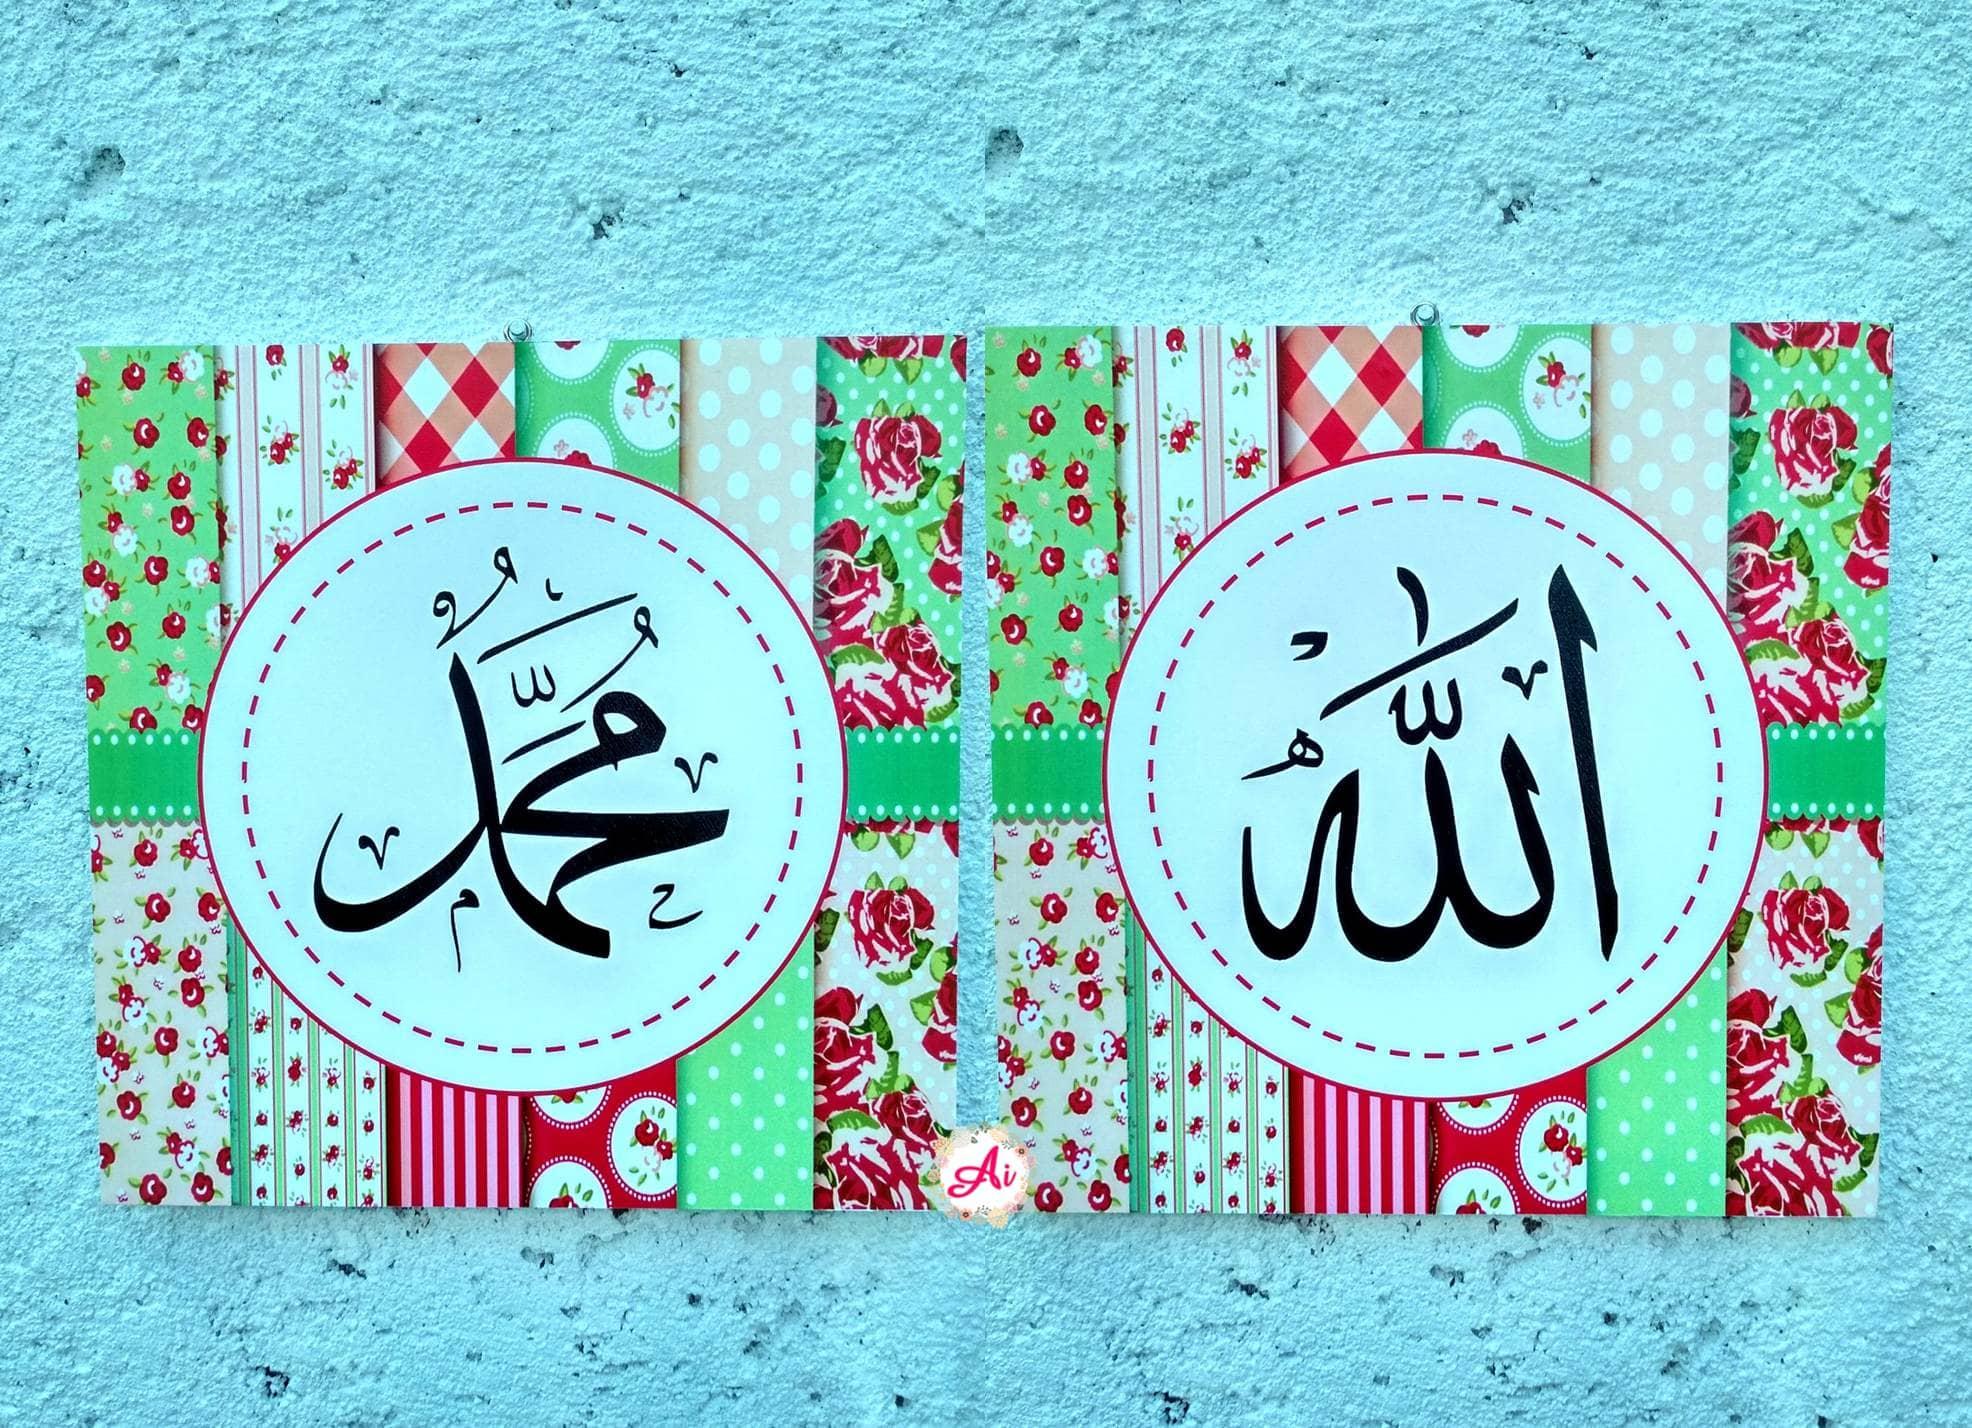 Jual Produk Ukm Dekorasi Rumah L Wall Decor Hiasan Dinding Bumn Car Charger 2 Usb Shabby Chic Kaligrafi 4